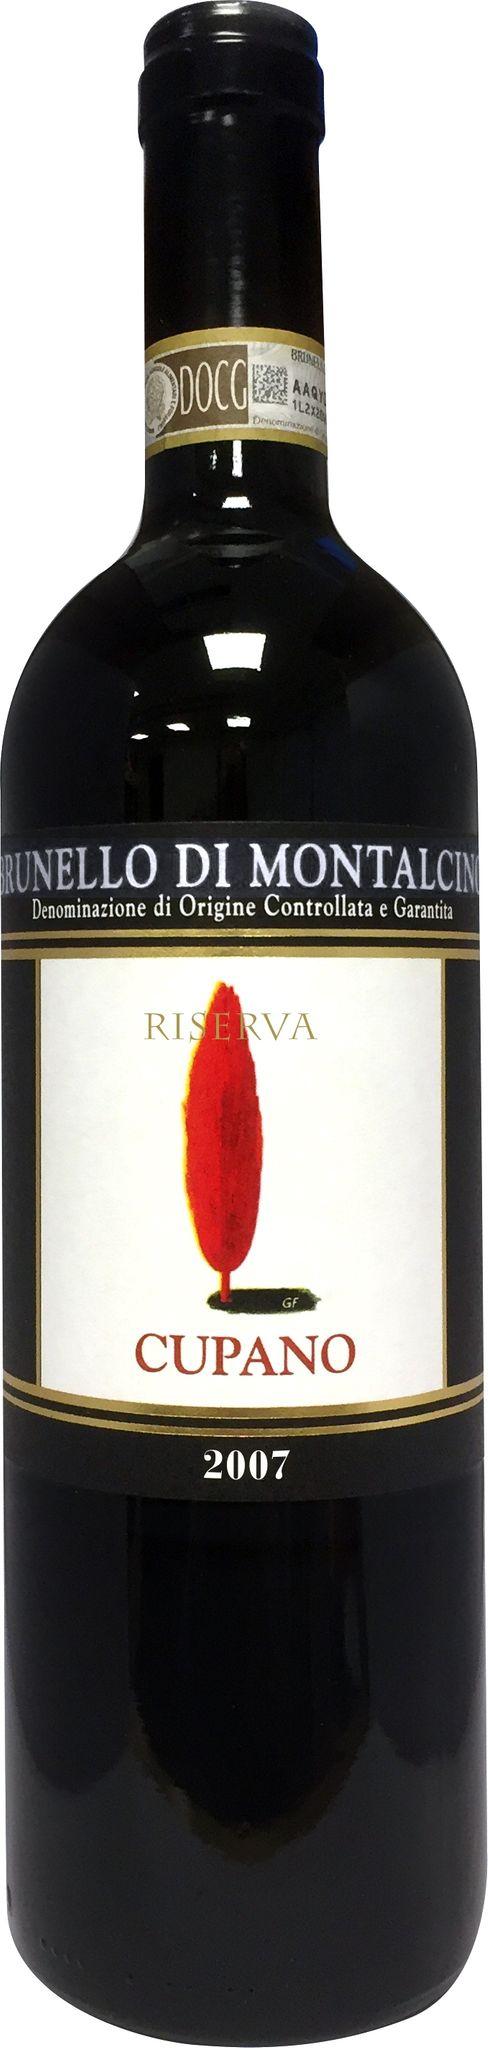 Produktbild på Brunello di Montalcino Riserva